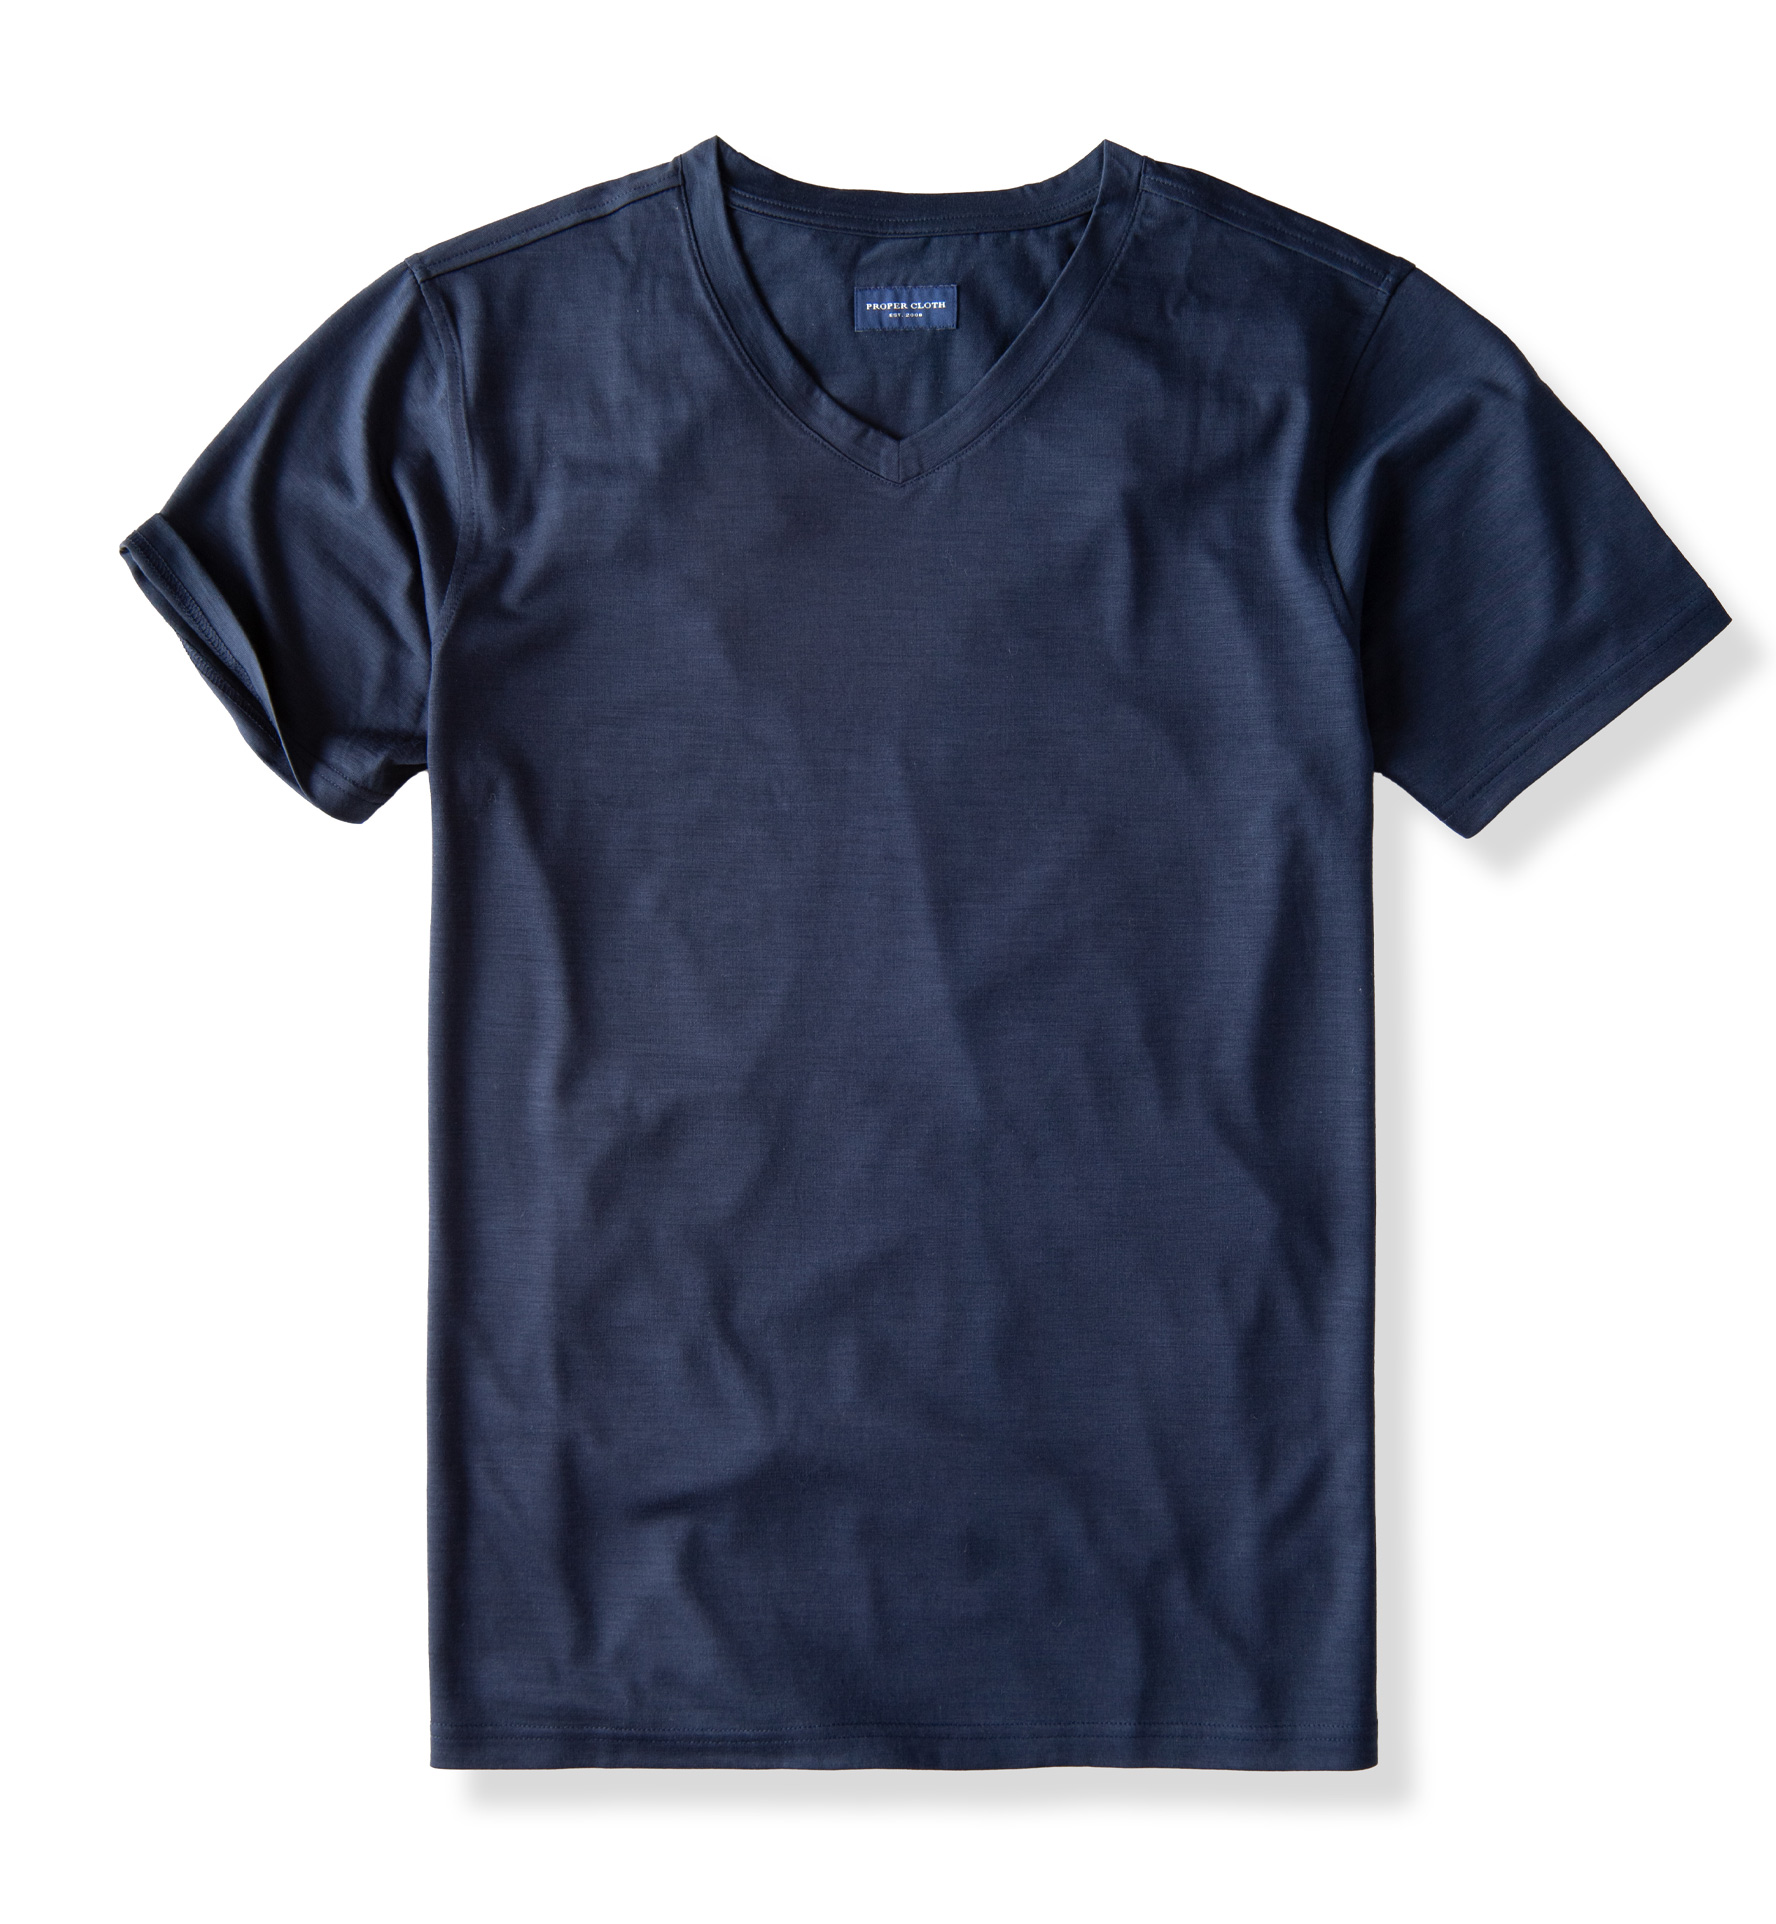 Zoom Image of Navy Merino Wool V-Neck T-Shirt